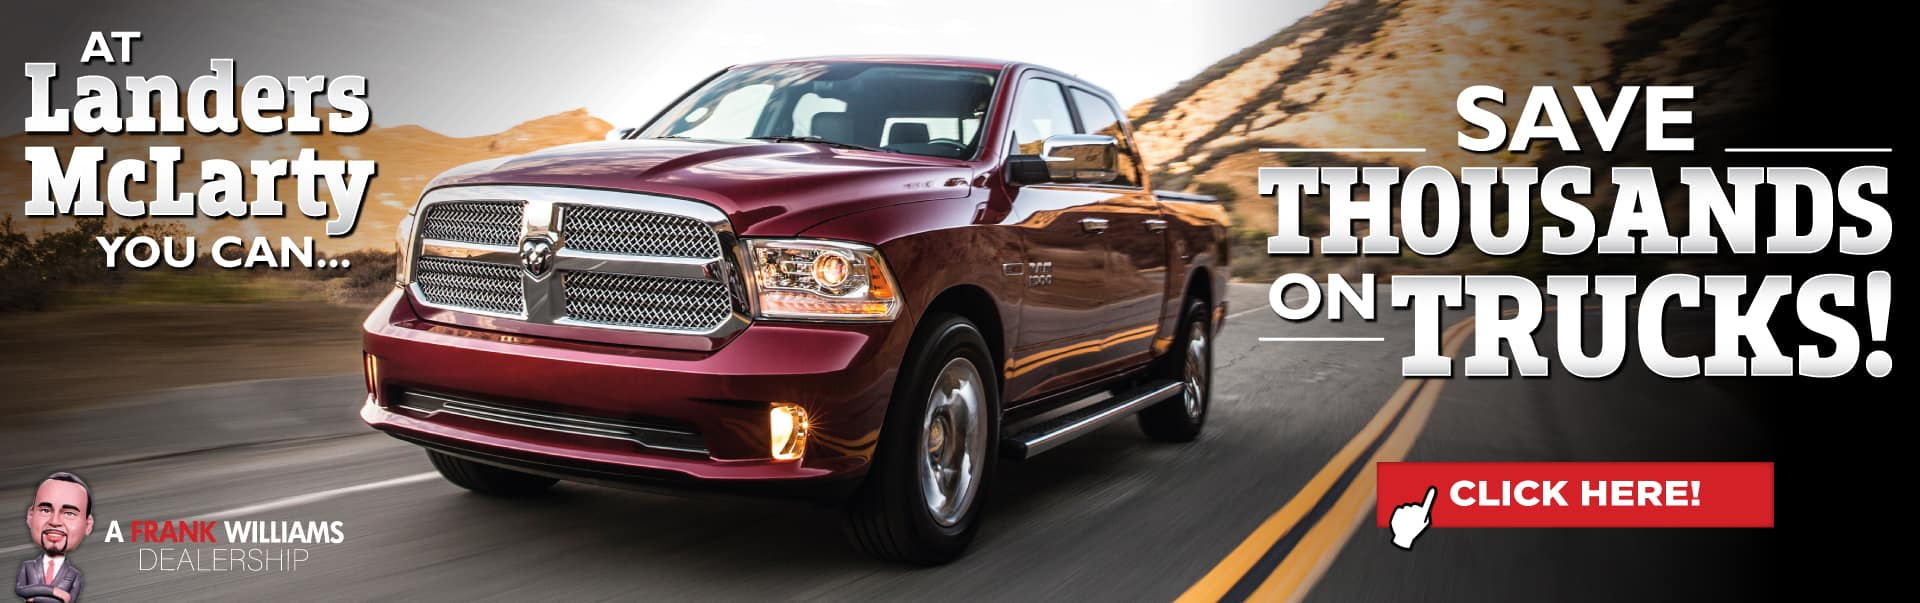 Landers Mclarty Dodge >> Landers McLarty Dodge Chrysler Jeep Ram Dealership ...